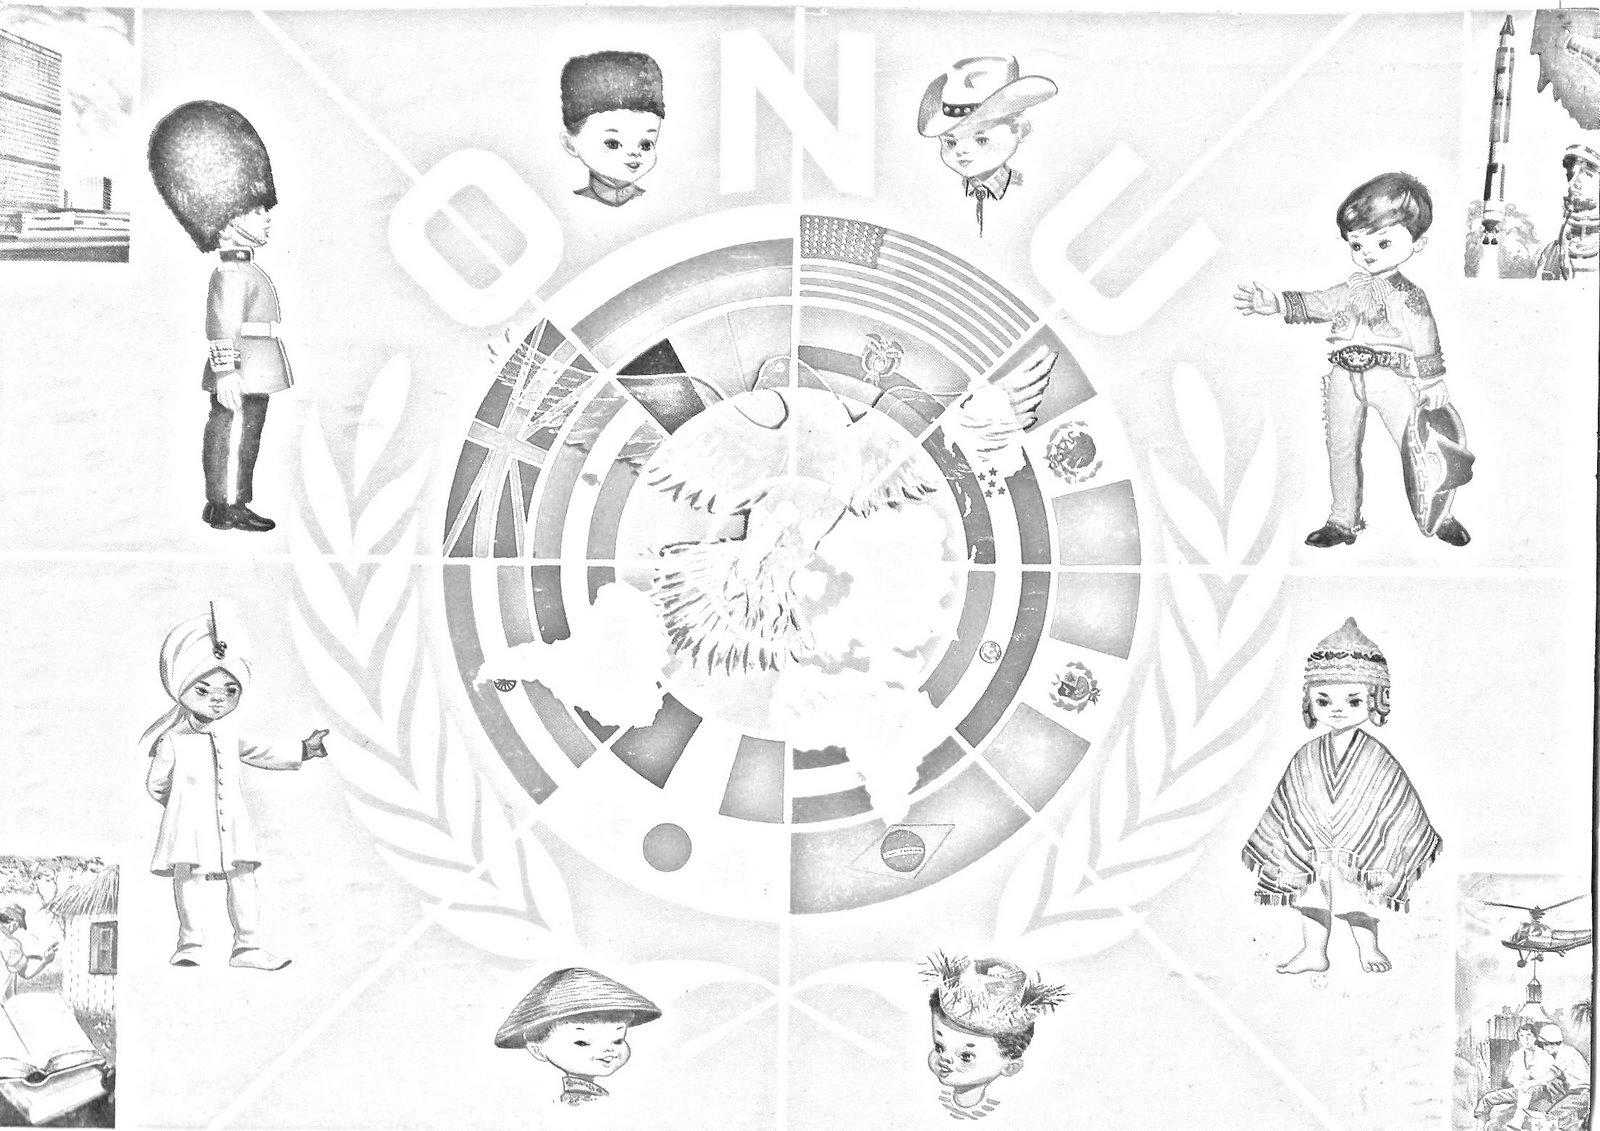 Ana De Austria Religión: ONU. Derechos Humanos